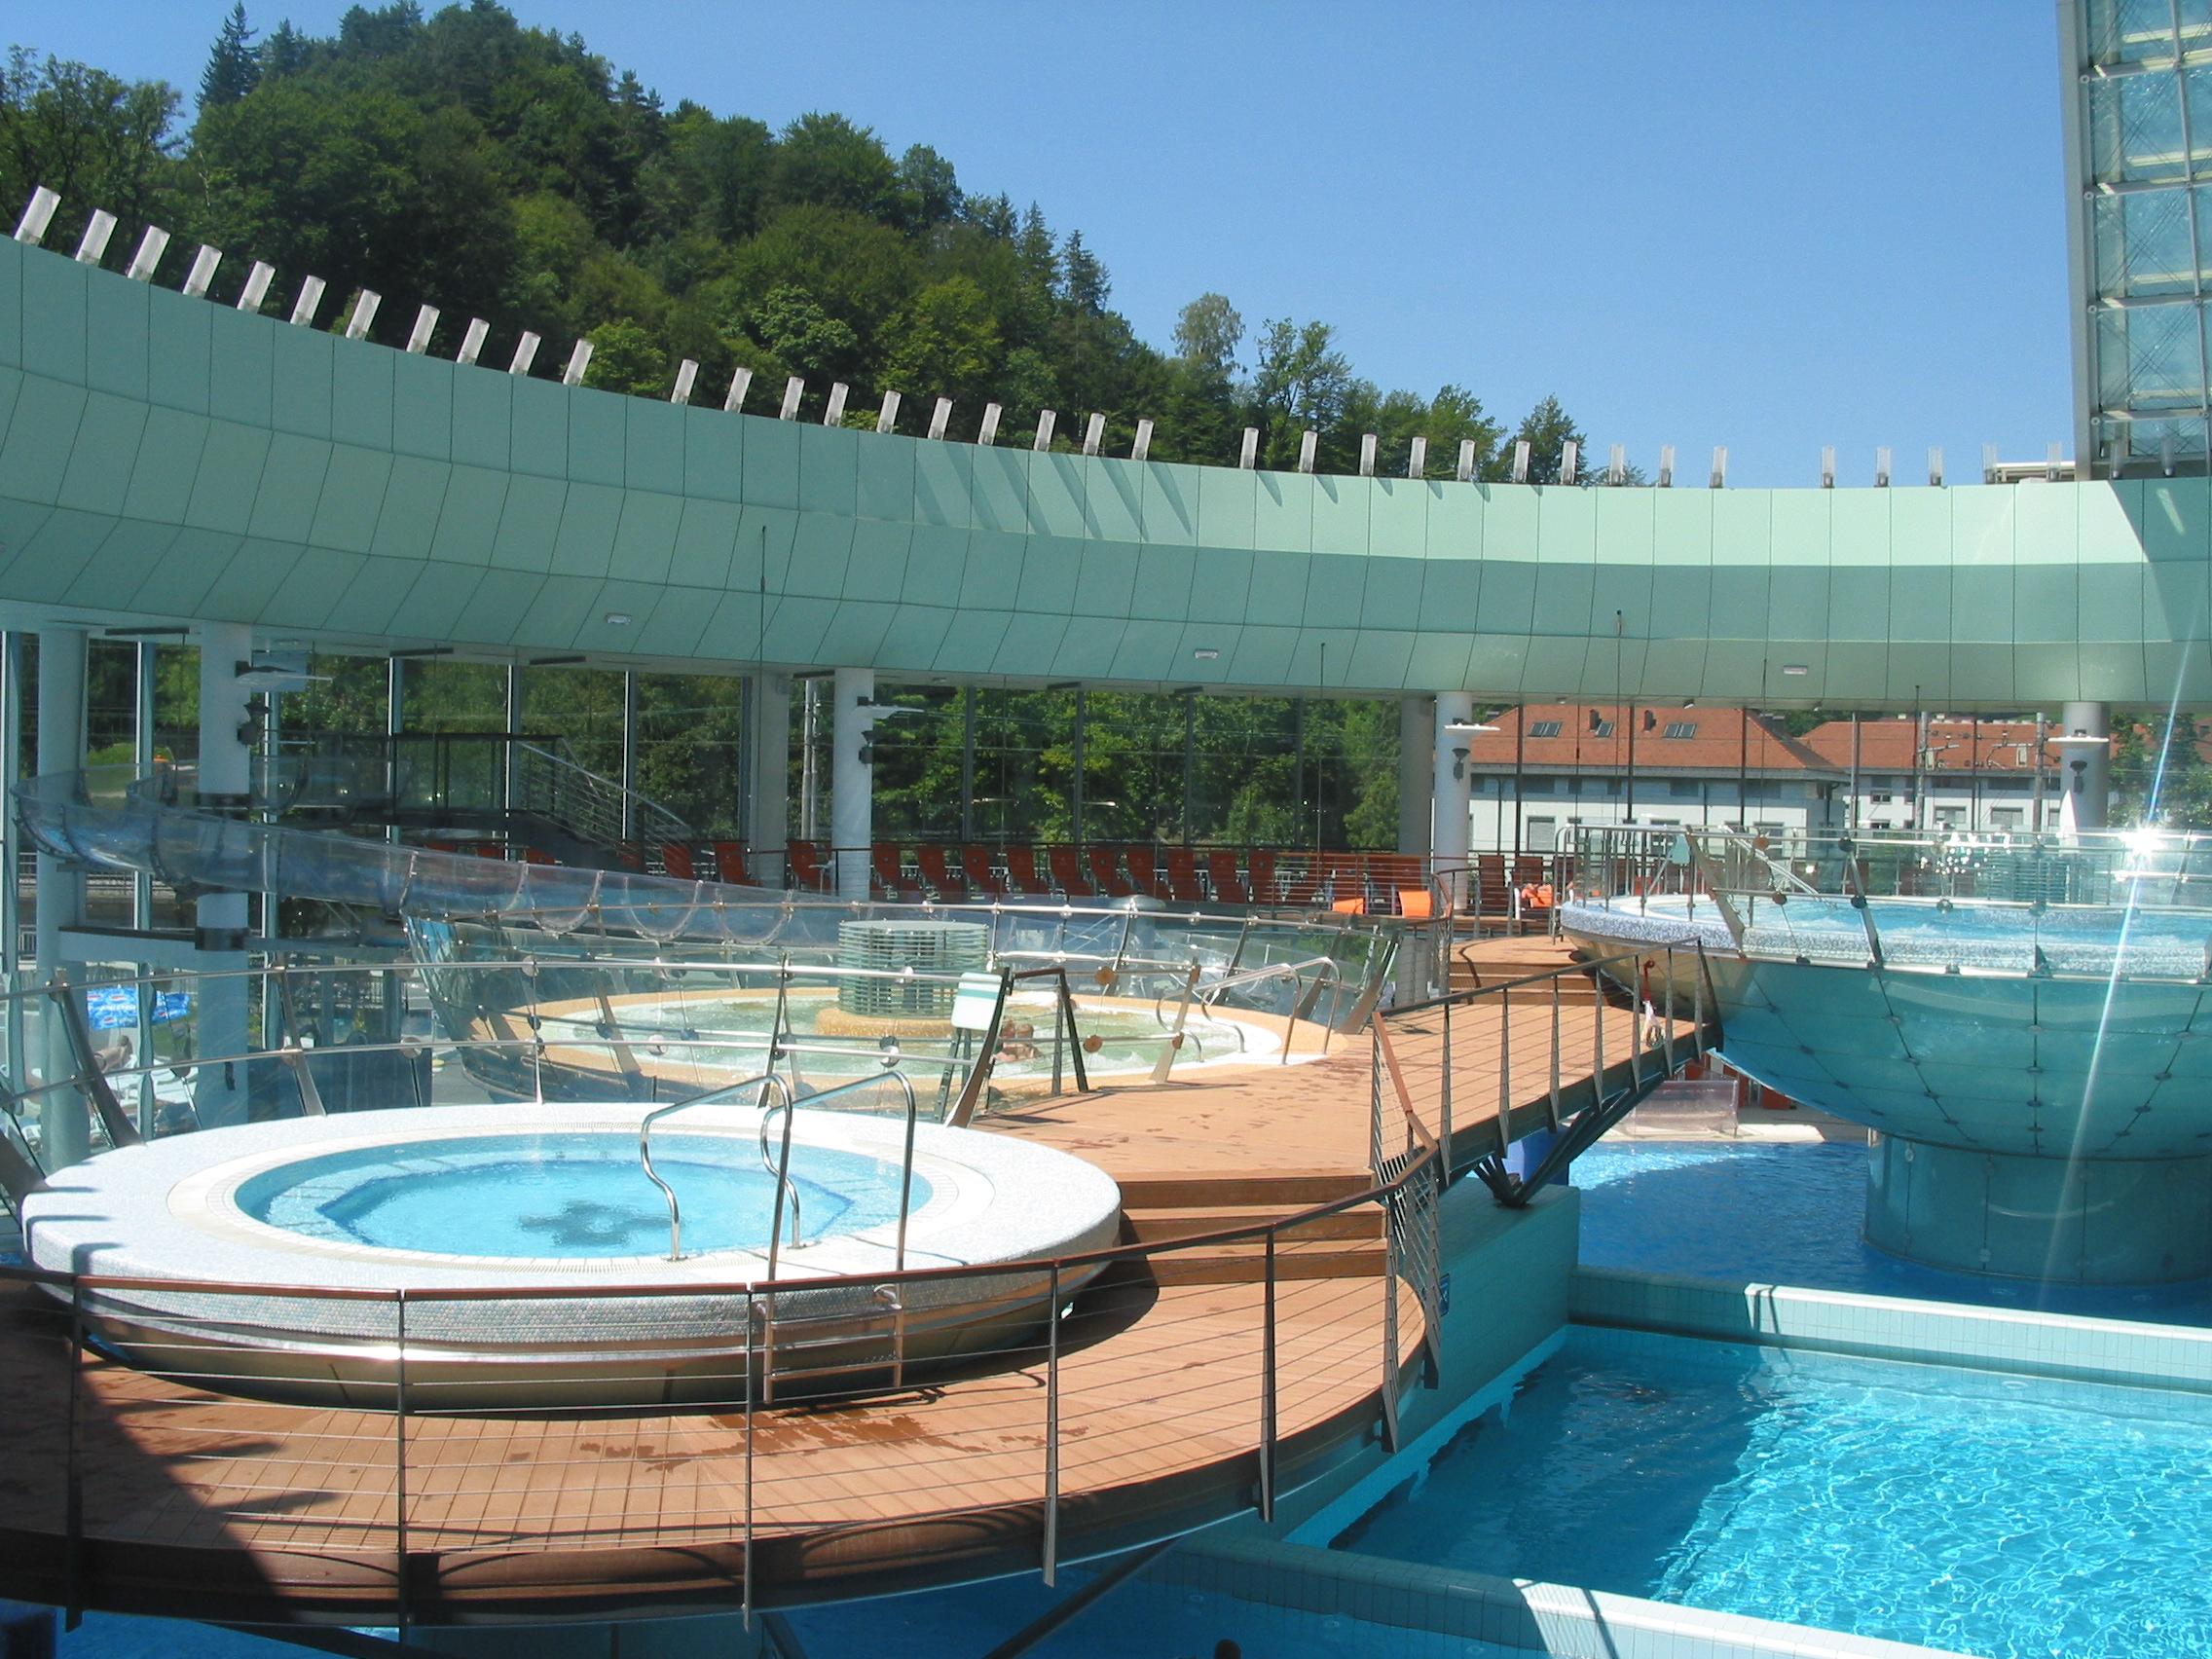 whirlpools - aquapark